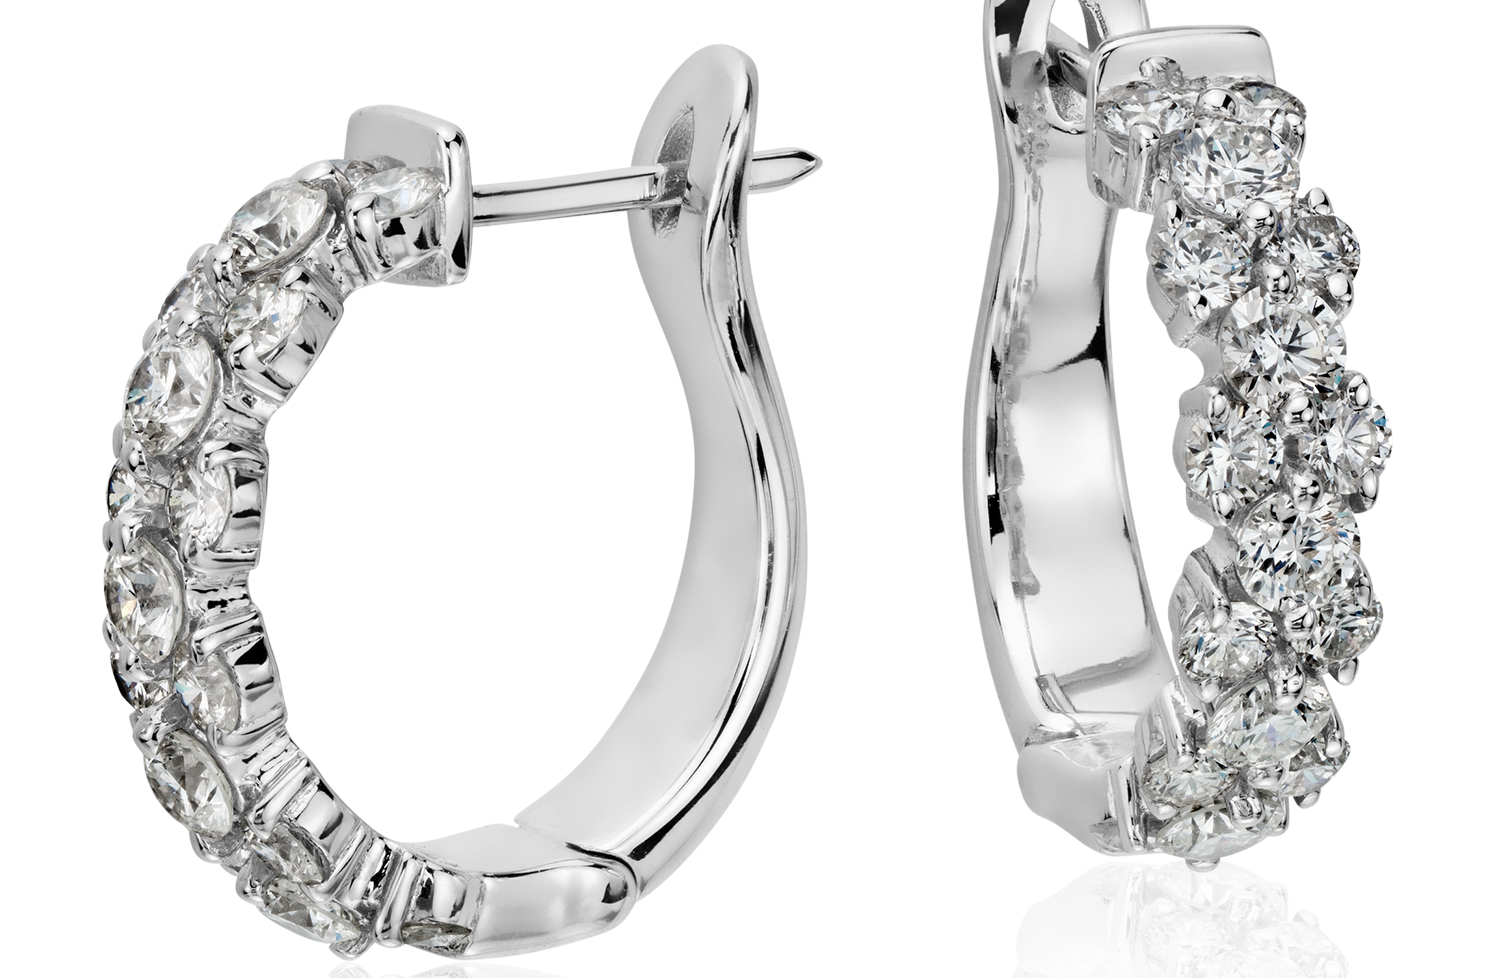 Garland Hoop Diamond Earrings in 18k White Gold (2 ct. tw.)